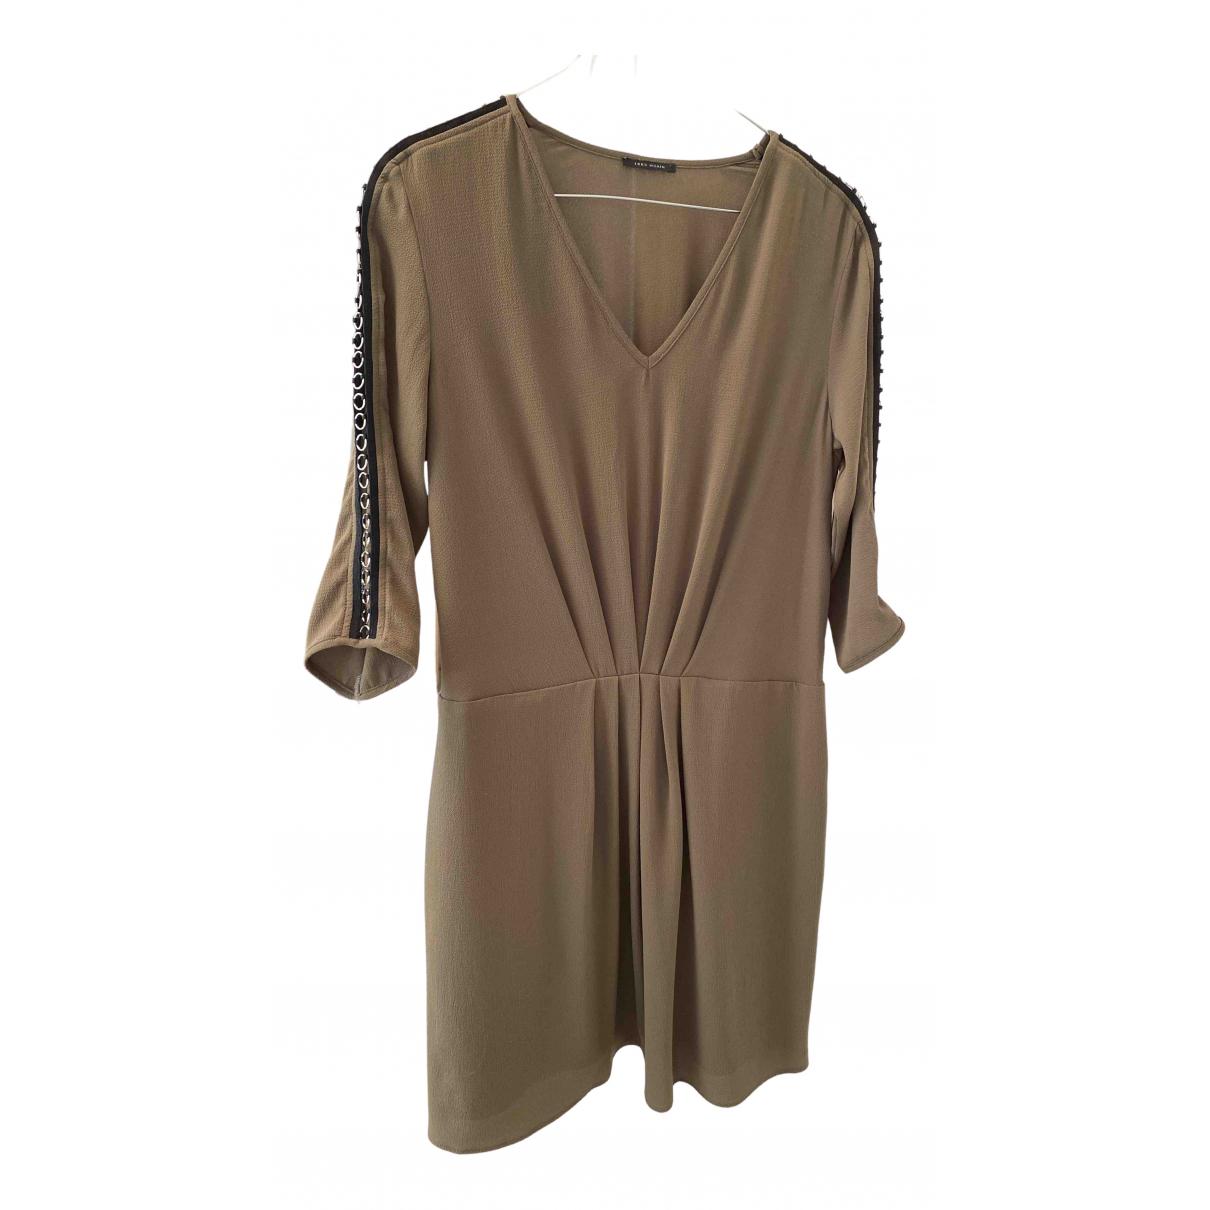 Ikks \N Kleid in  Khaki Polyester